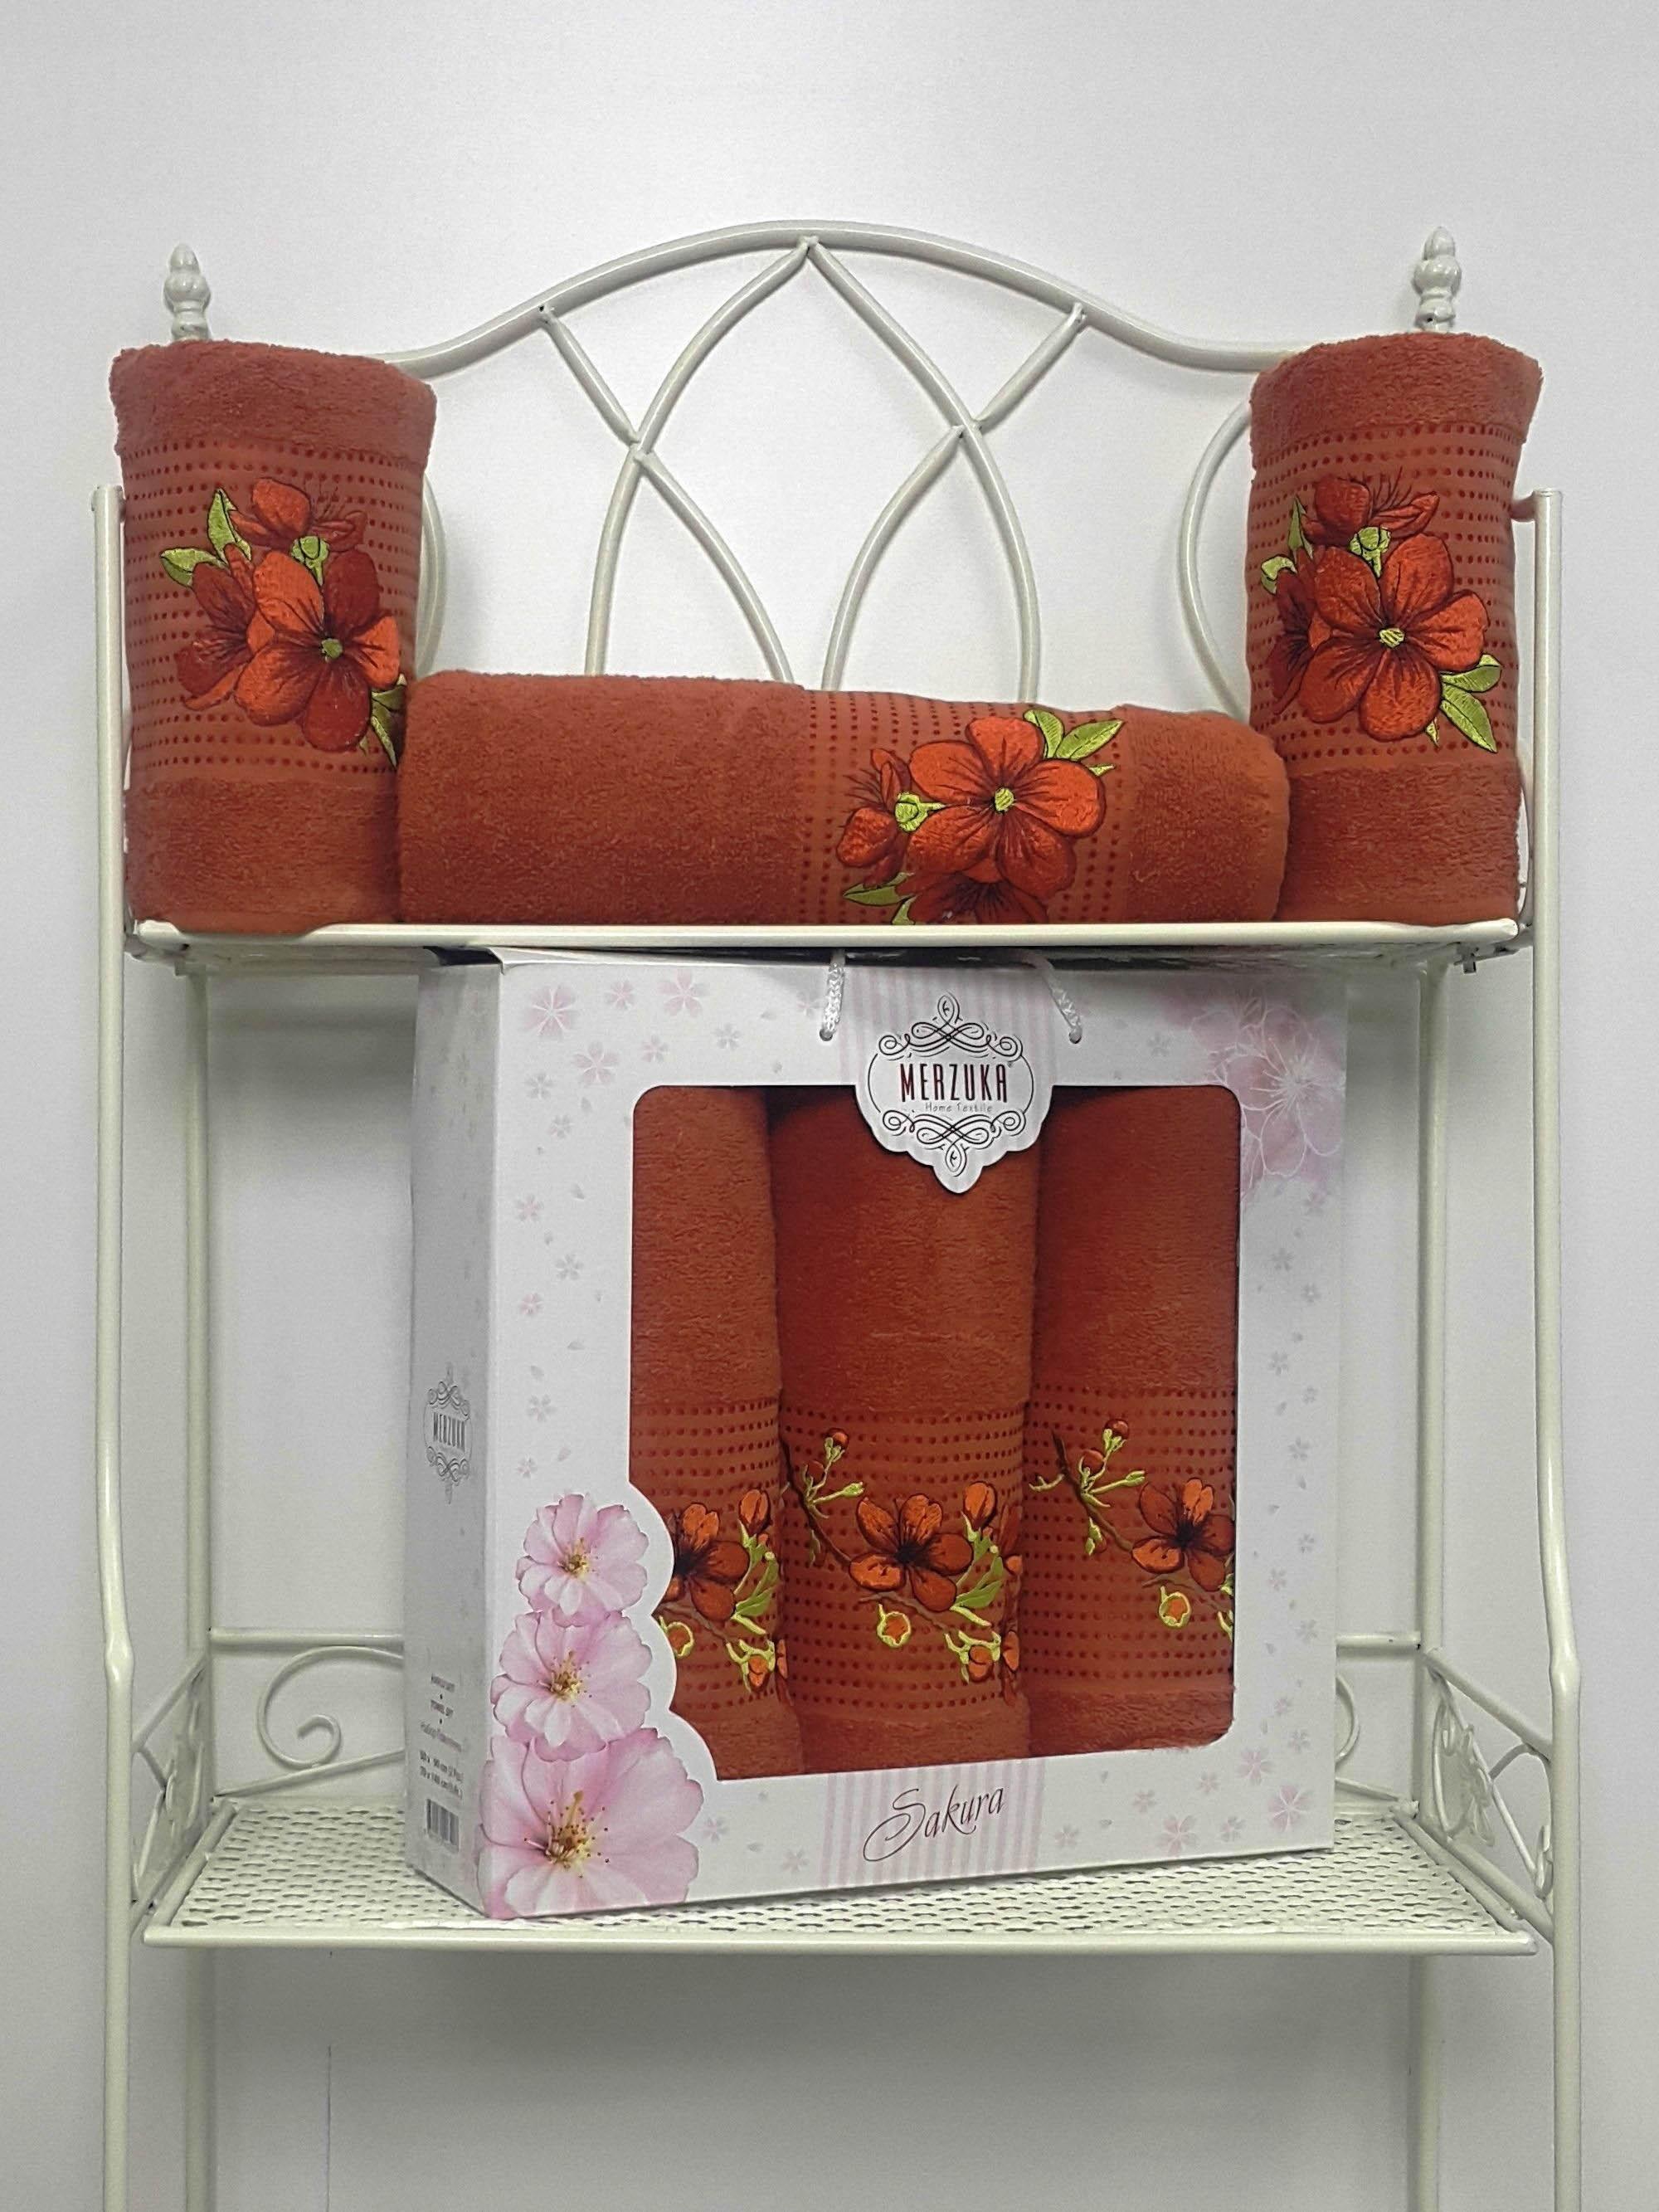 Полотенца Oran Merzuka Полотенце Sakura Цвет: Терракотовый (Набор) полотенца oran merzuka полотенце sakura цвет светло лиловый набор